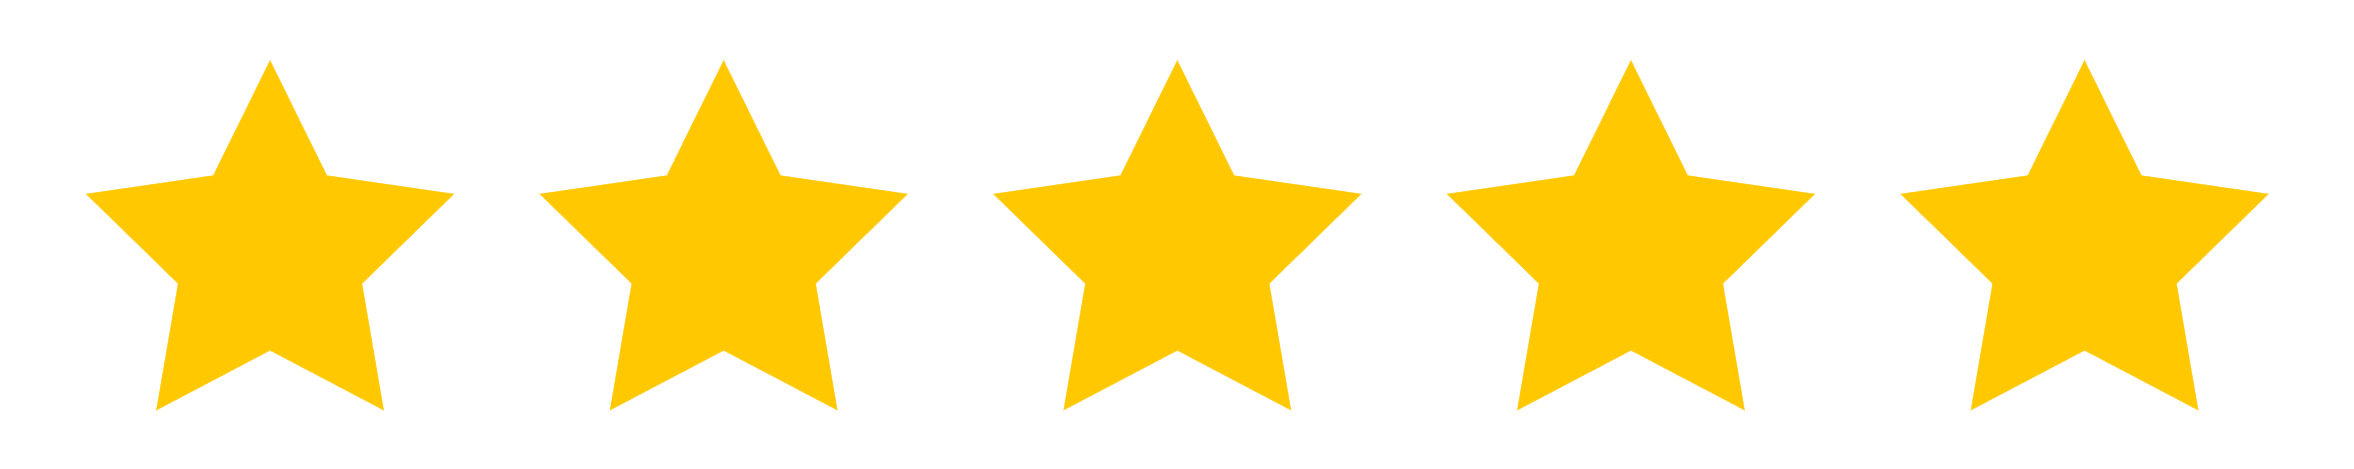 Reviews star rating from Diane C. for A-1 Self Storage in San Juan Capistrano, California